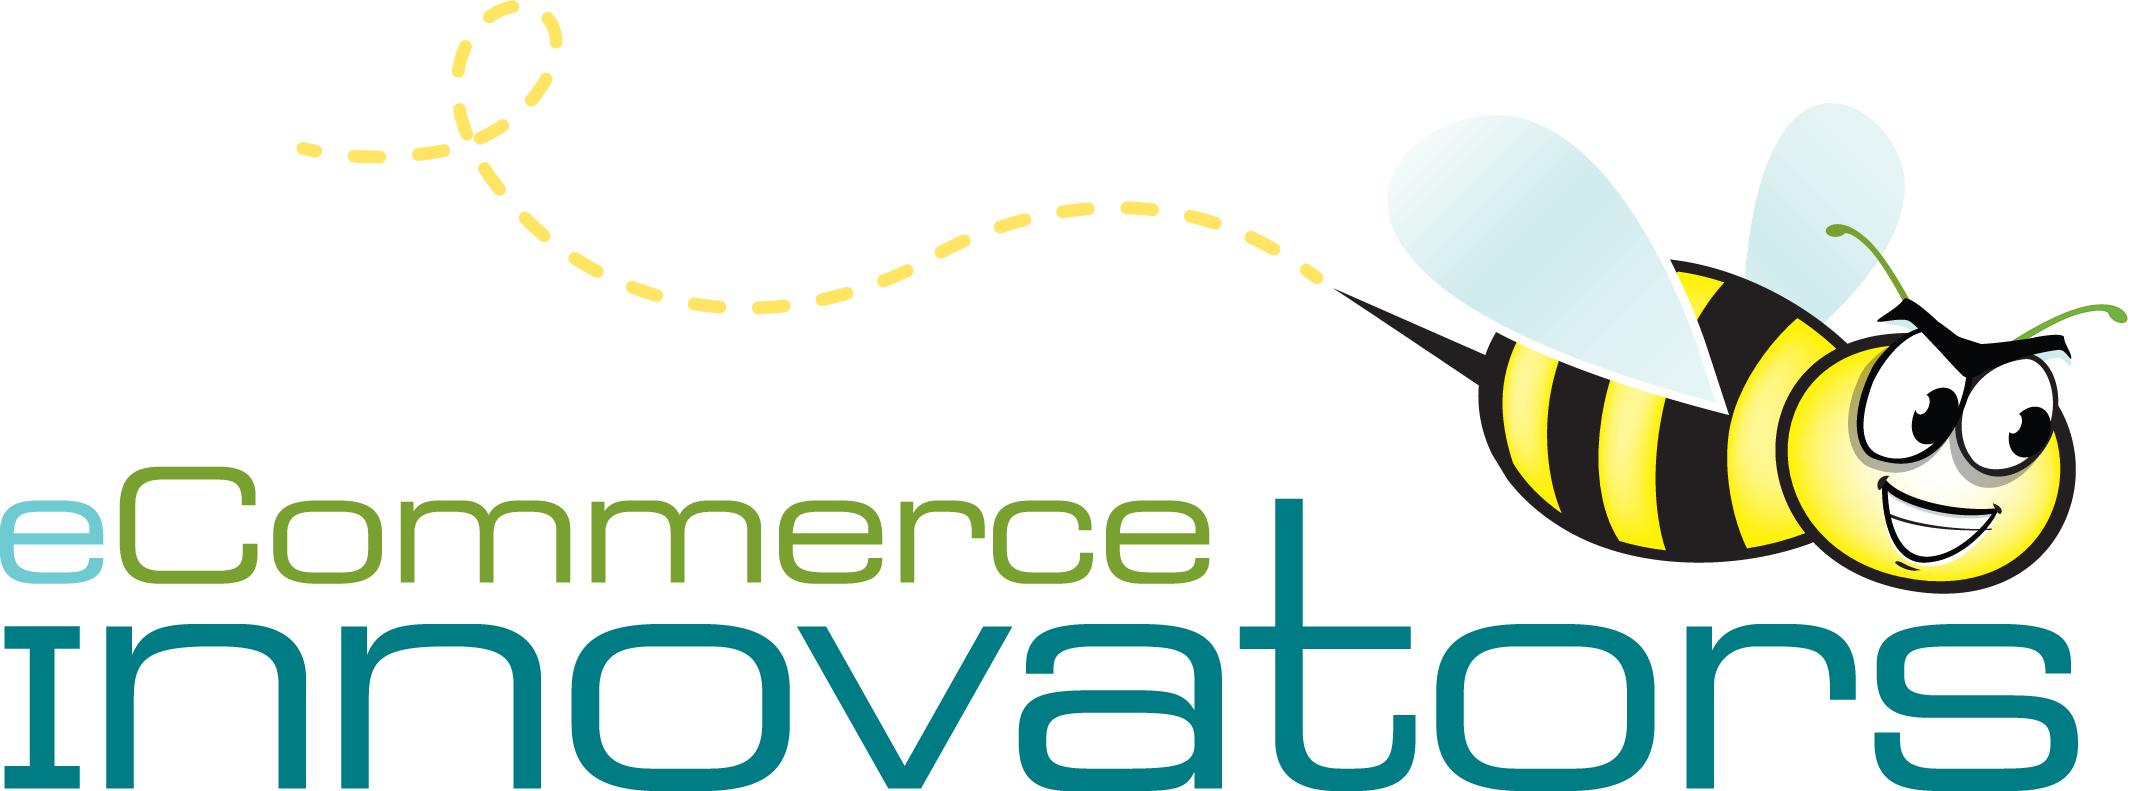 eCommerce Innovators